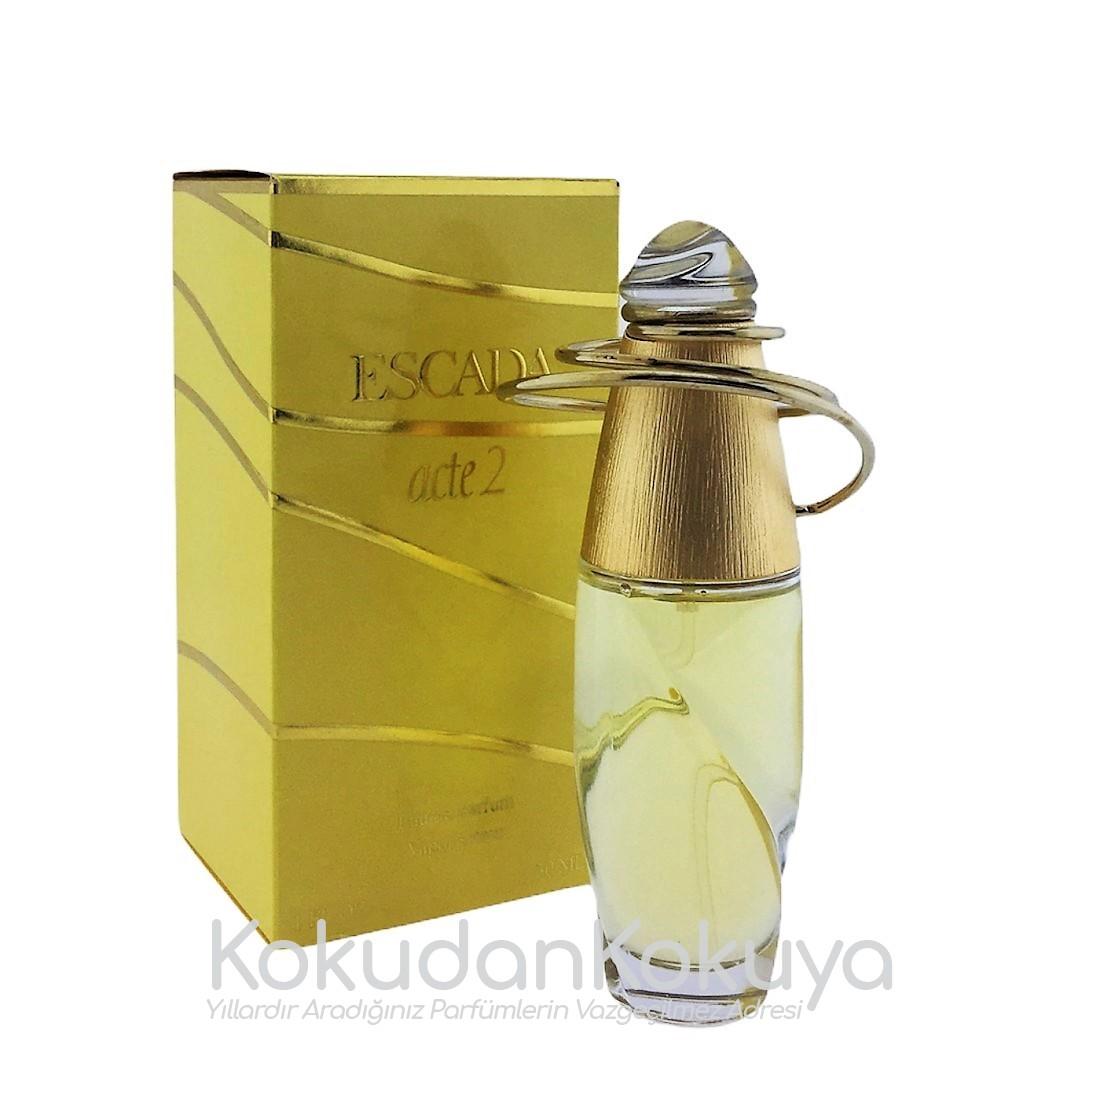 ESCADA Acte 2 (Vintage) Parfüm Kadın 30ml Eau De Parfum (EDP) Sprey